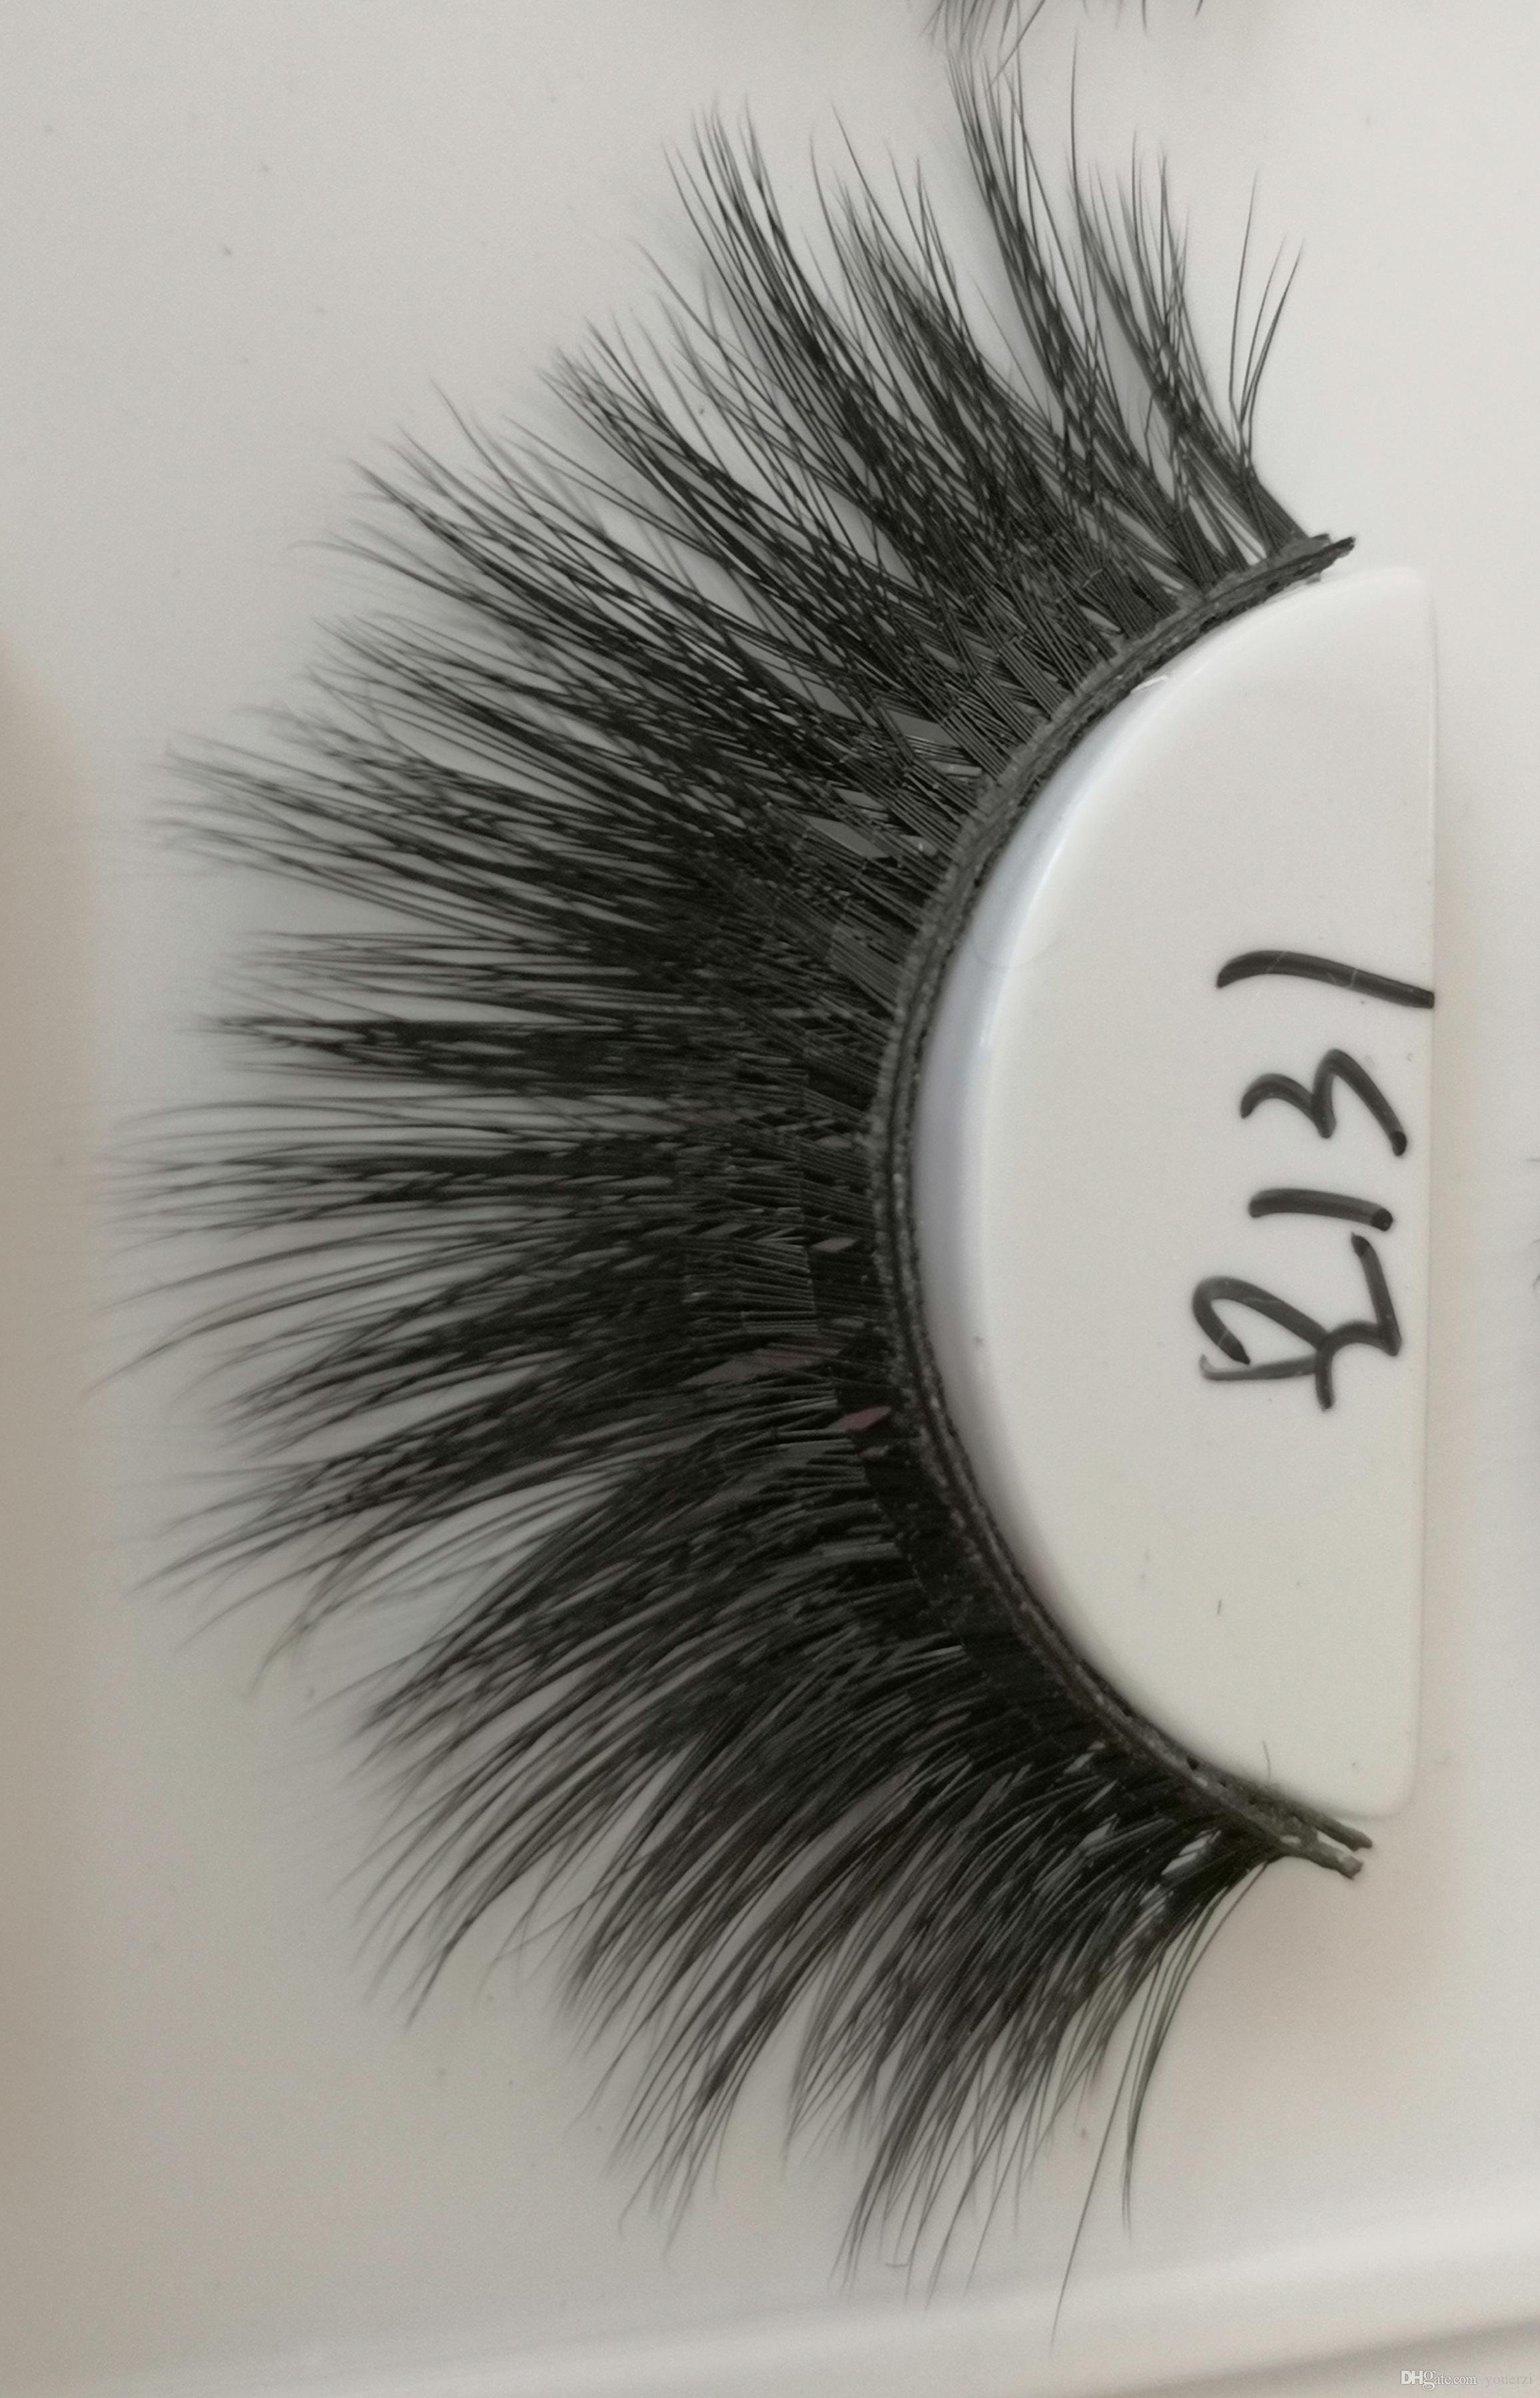 Q131 False eyelashes 3D chemical fiber 0.07 soft natural realistic custom brand custom packaging handmade wholesaler